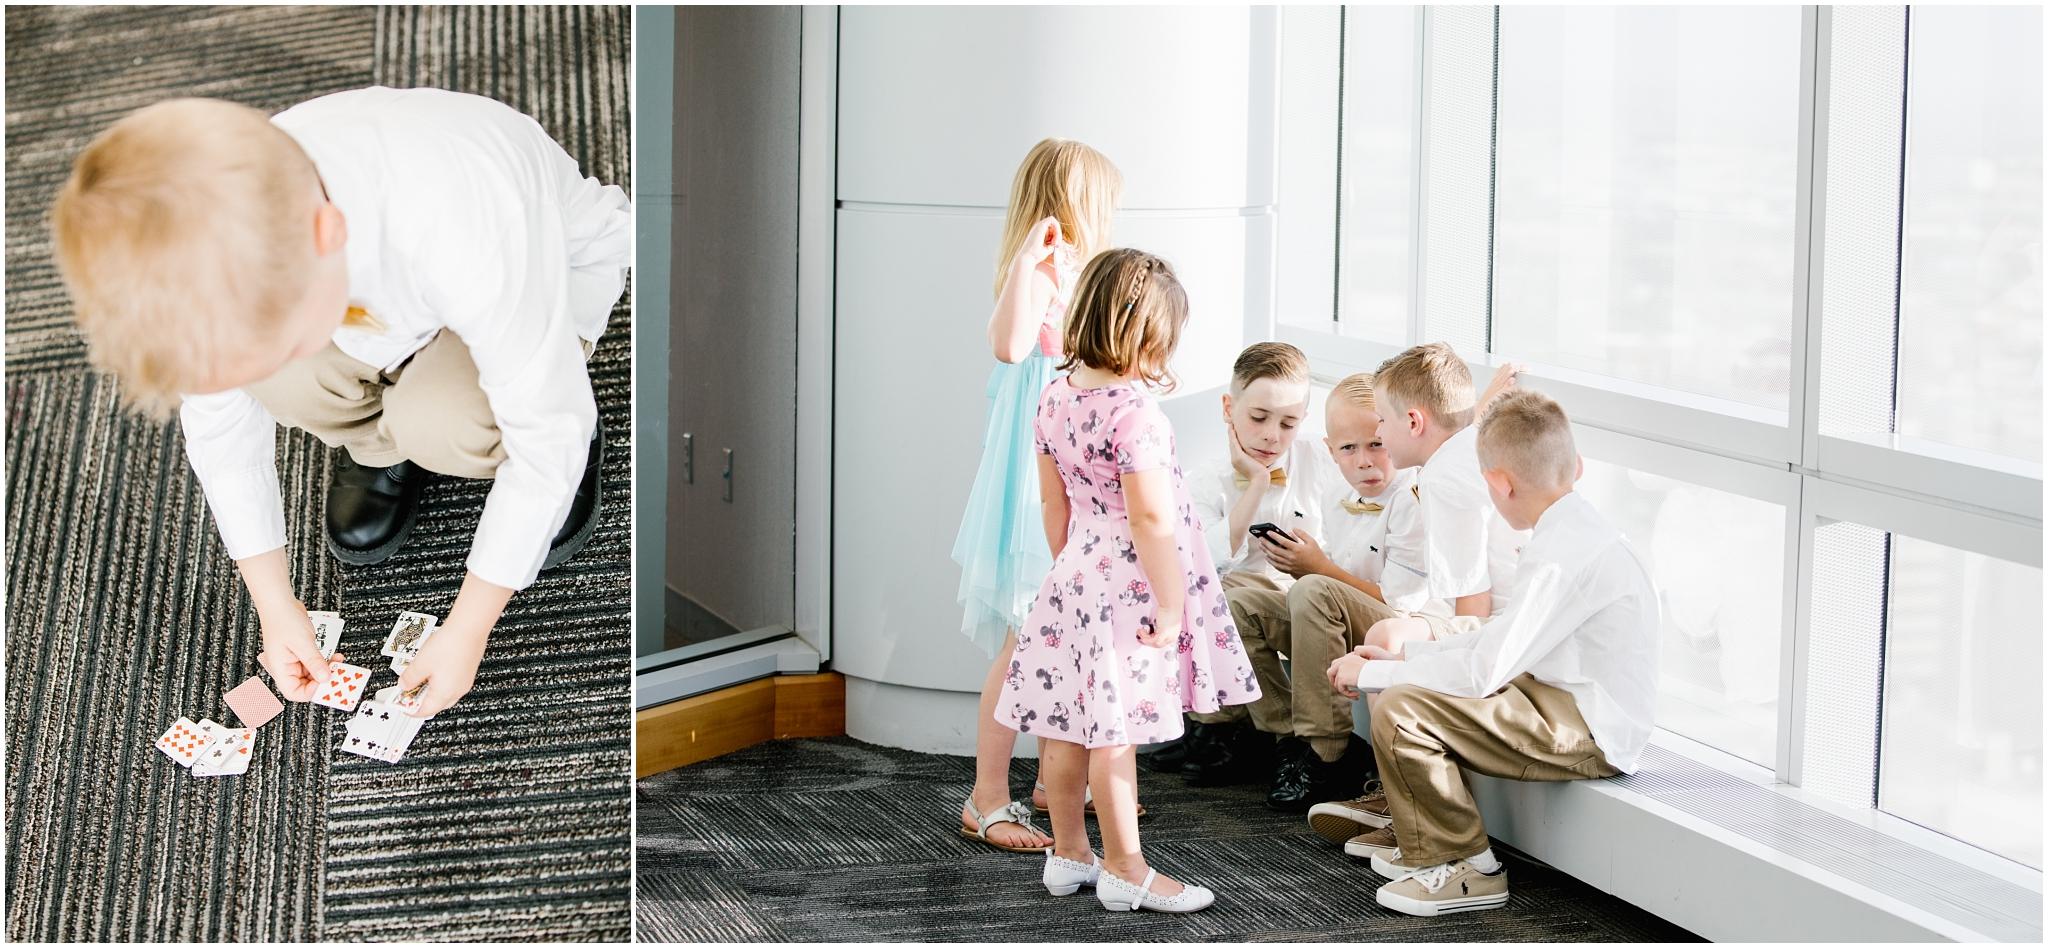 CherylandTyler-500_Lizzie-B-Imagery-Utah-Wedding-Photographer-Salt-Lake-City-Temple-Wells-Fargo-Building-Reception.jpg